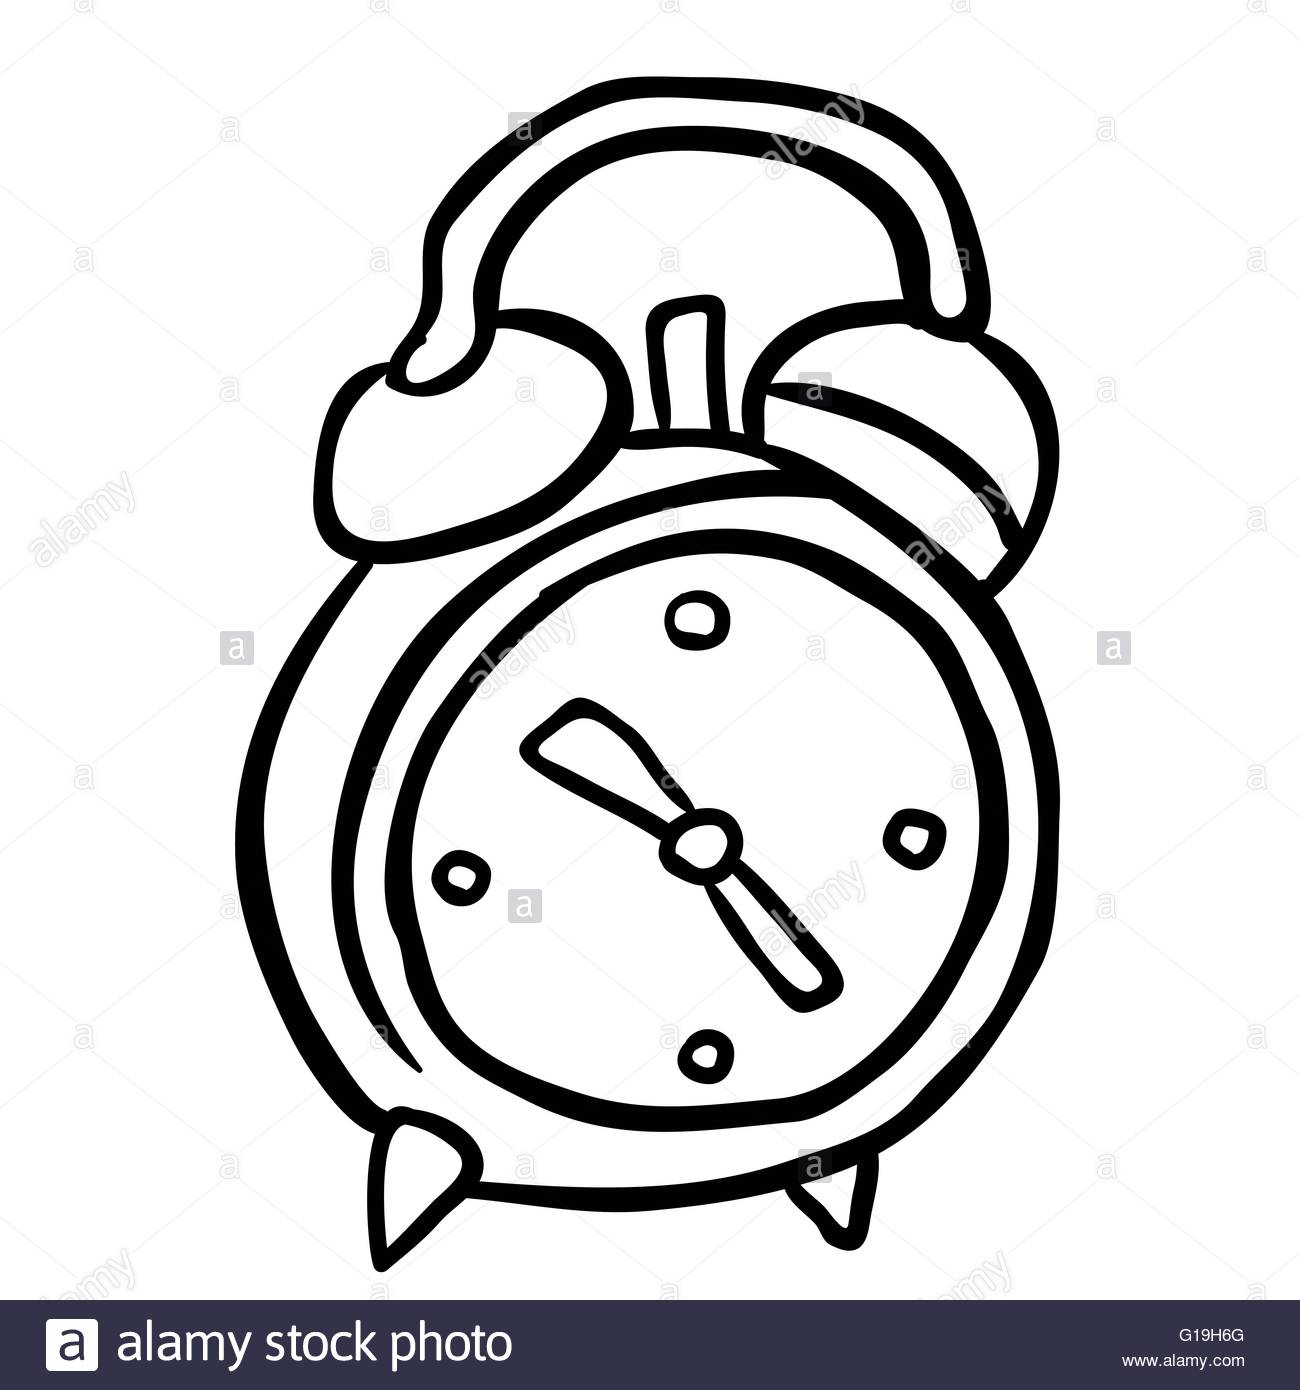 1300x1390 Simple Black And White Alarm Clock Cartoon Stock Vector Art